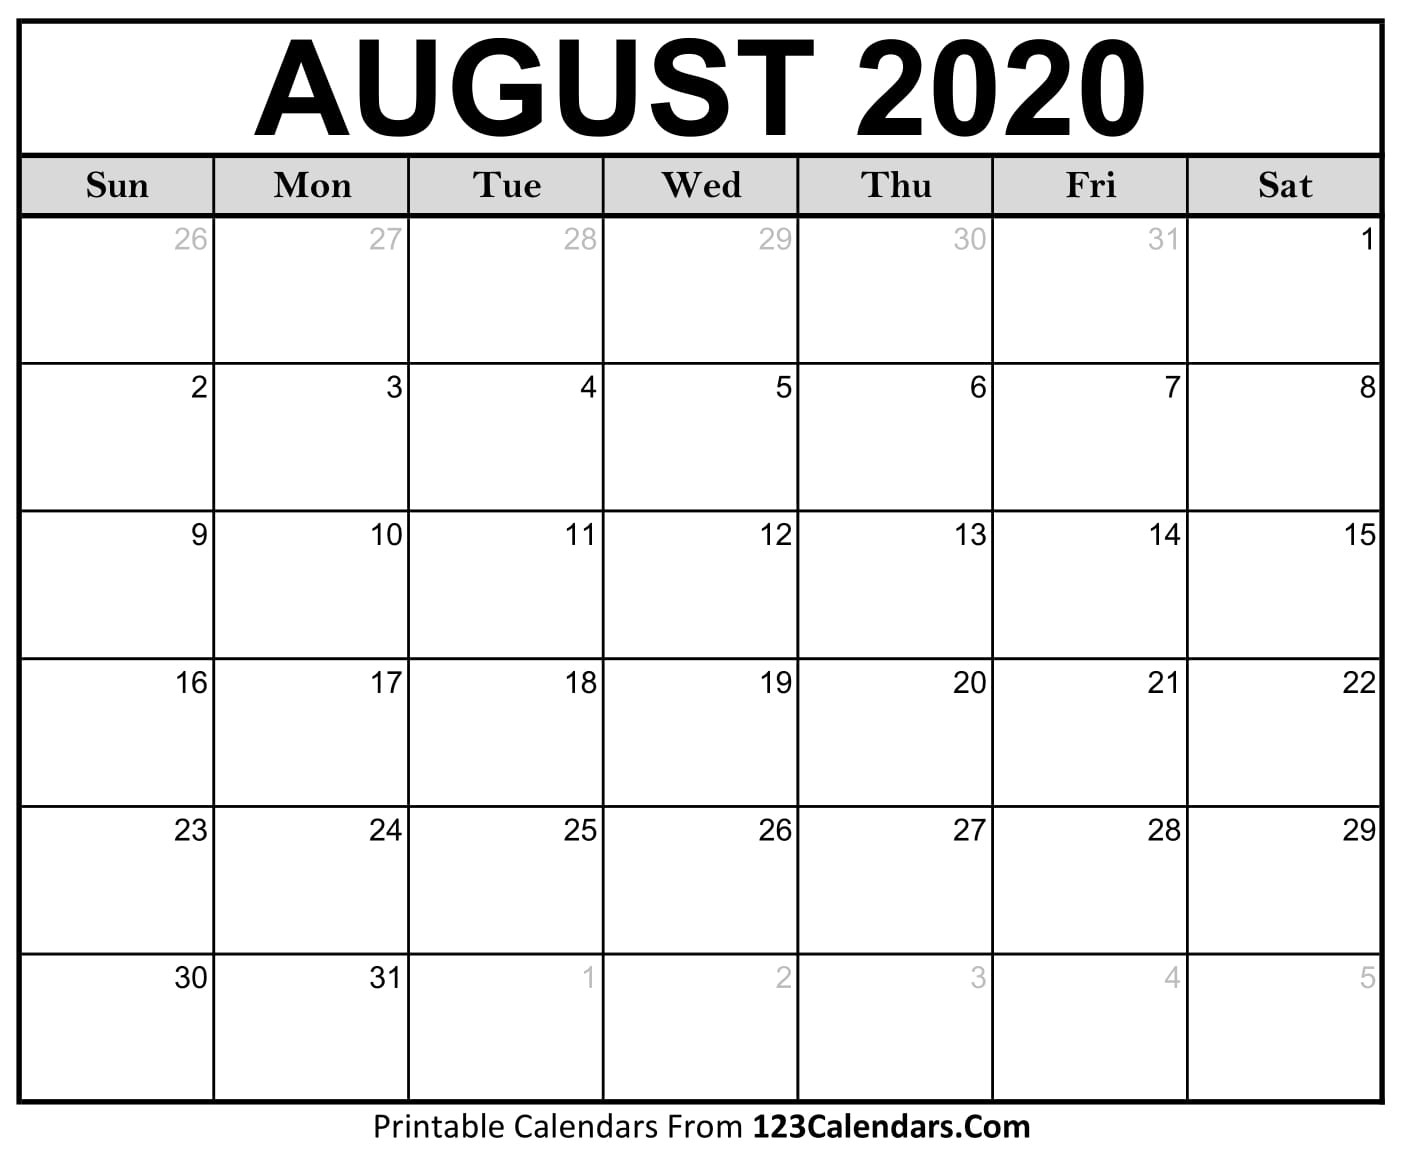 August 2020 Printable Calendar | 123Calendars  August 2020 Calendar